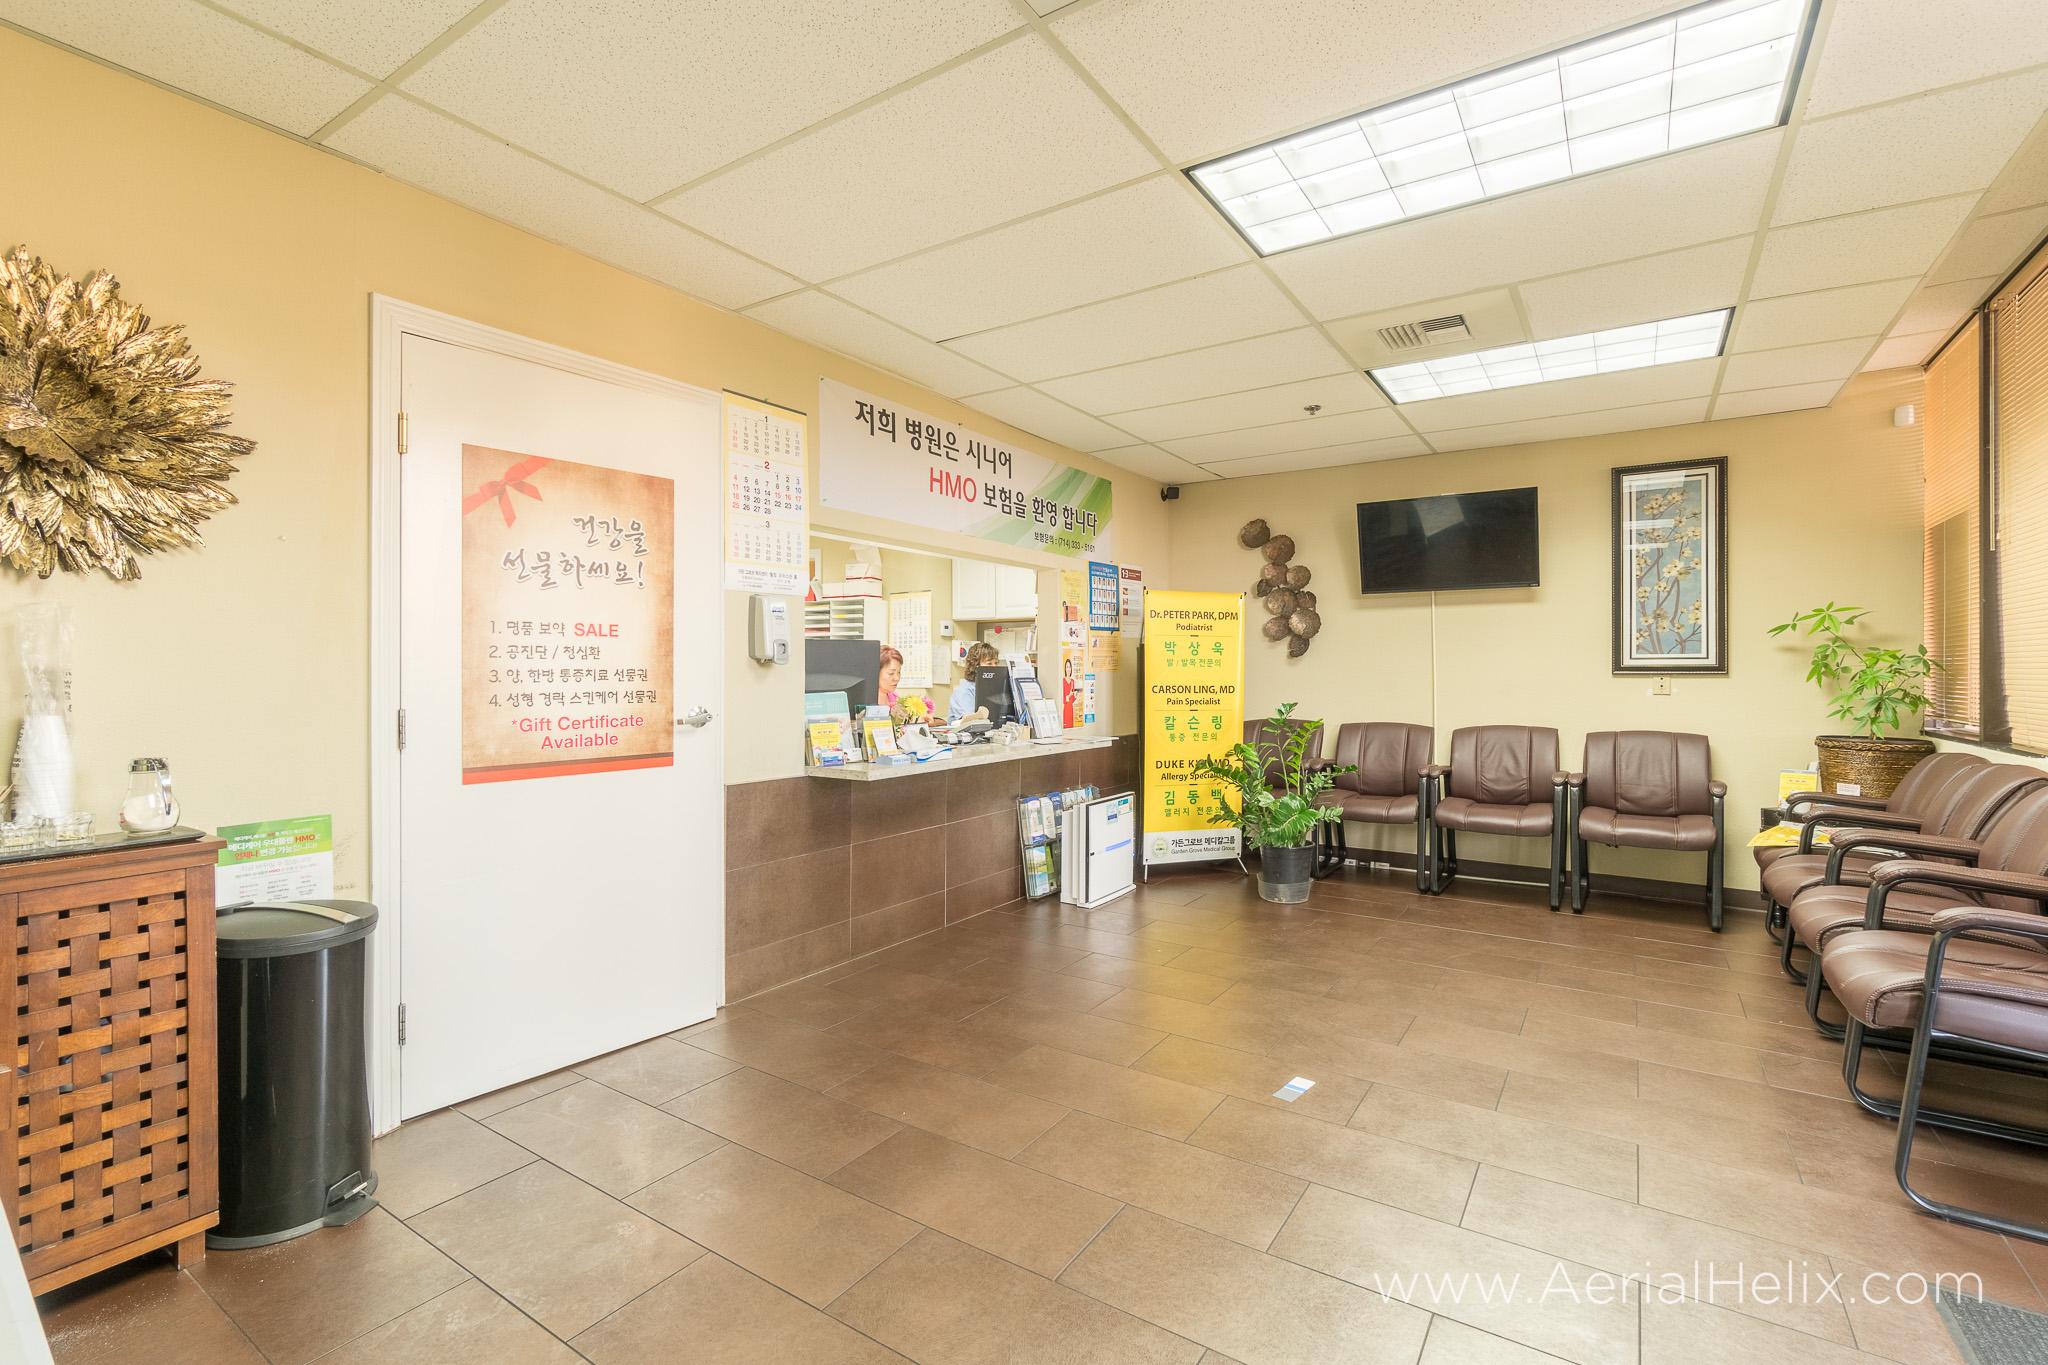 Garden Grove Medical Offices Commercial real estate photographer-23.jpg